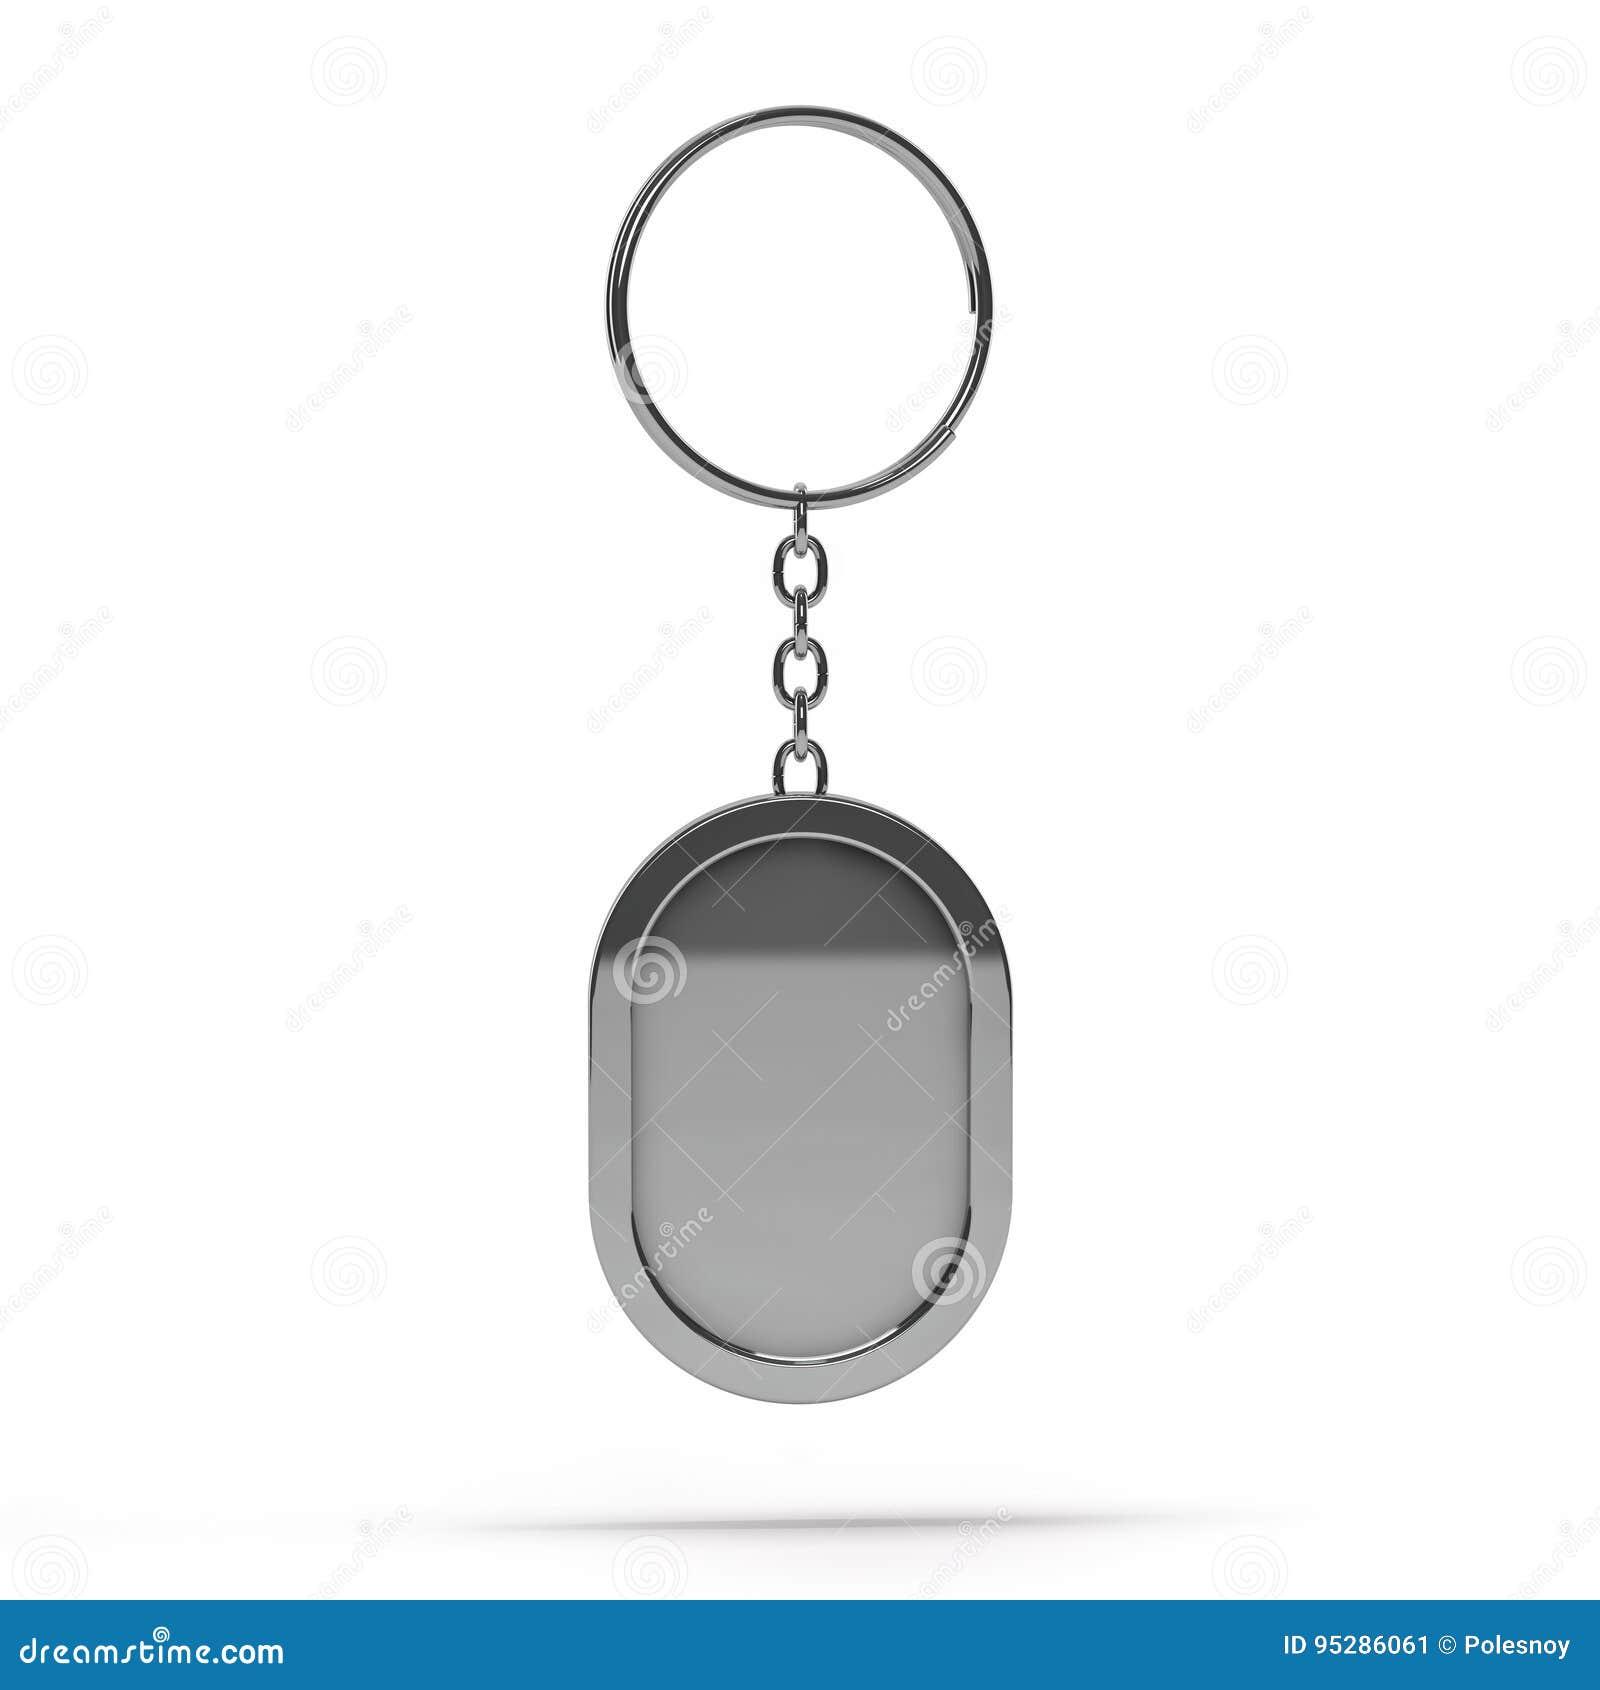 Blank Metal Keychain  Mockup Stock Illustration - Illustration of